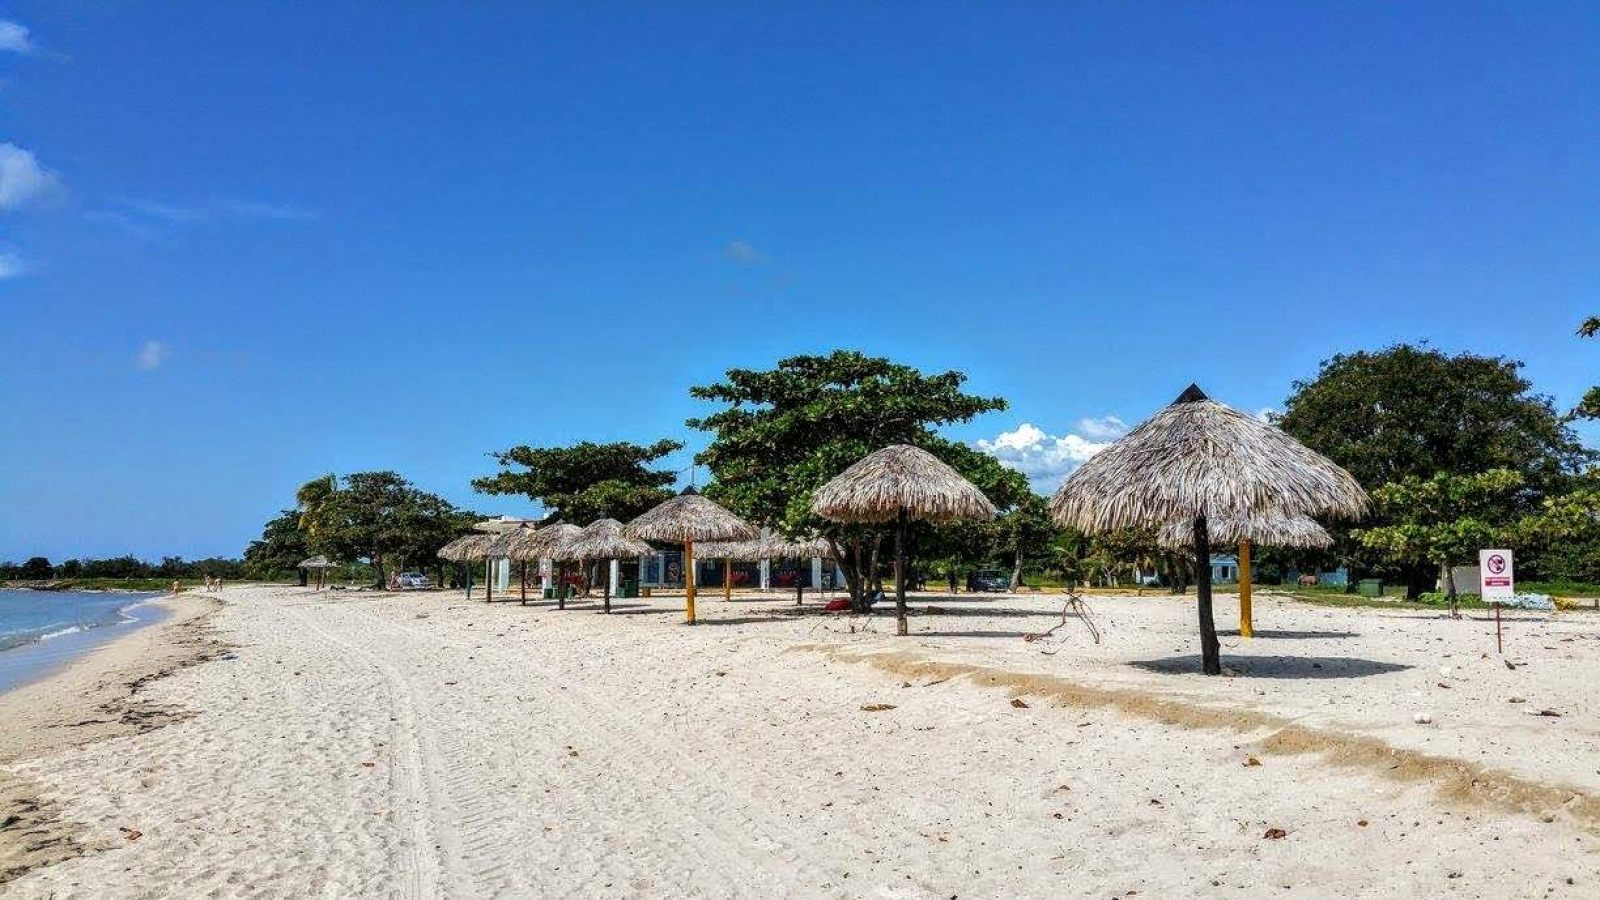 Hibiscus & Nomada : Cuba - Playa Ancon, Cuba, Backpacking, Backpackers, Carib